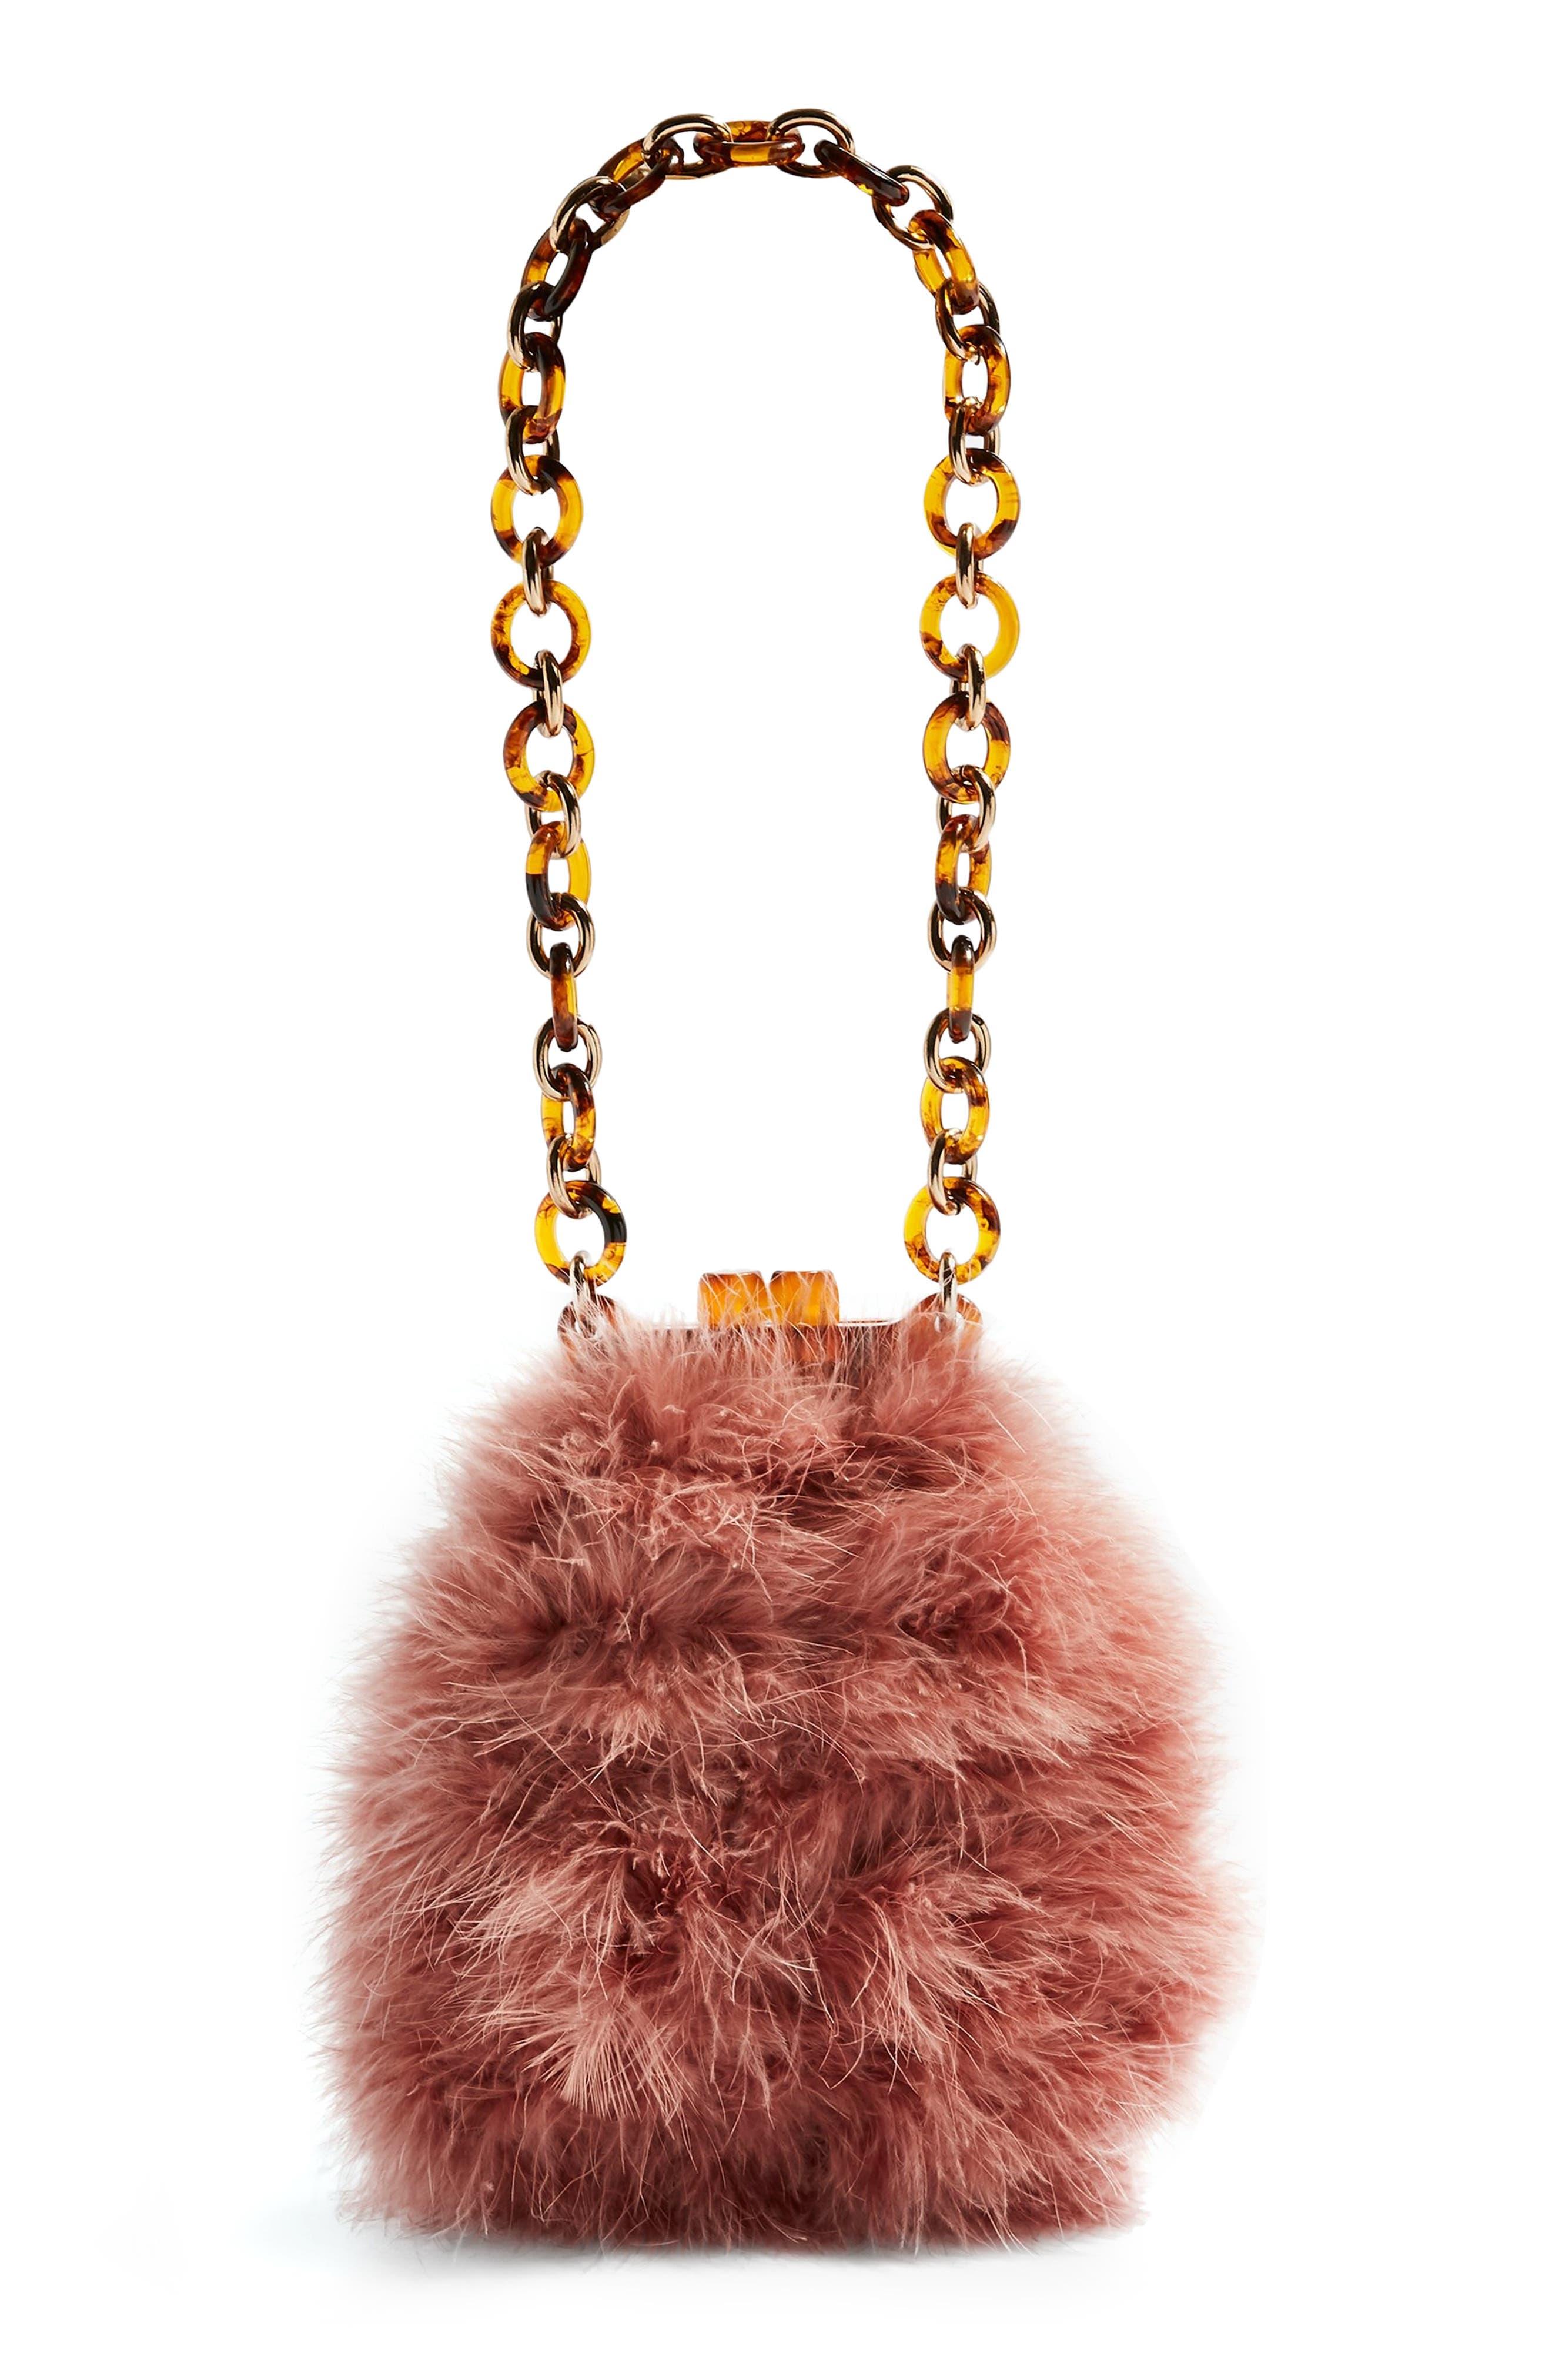 Marabou Feather Frame Handbag, Main, color, PINK MULTI